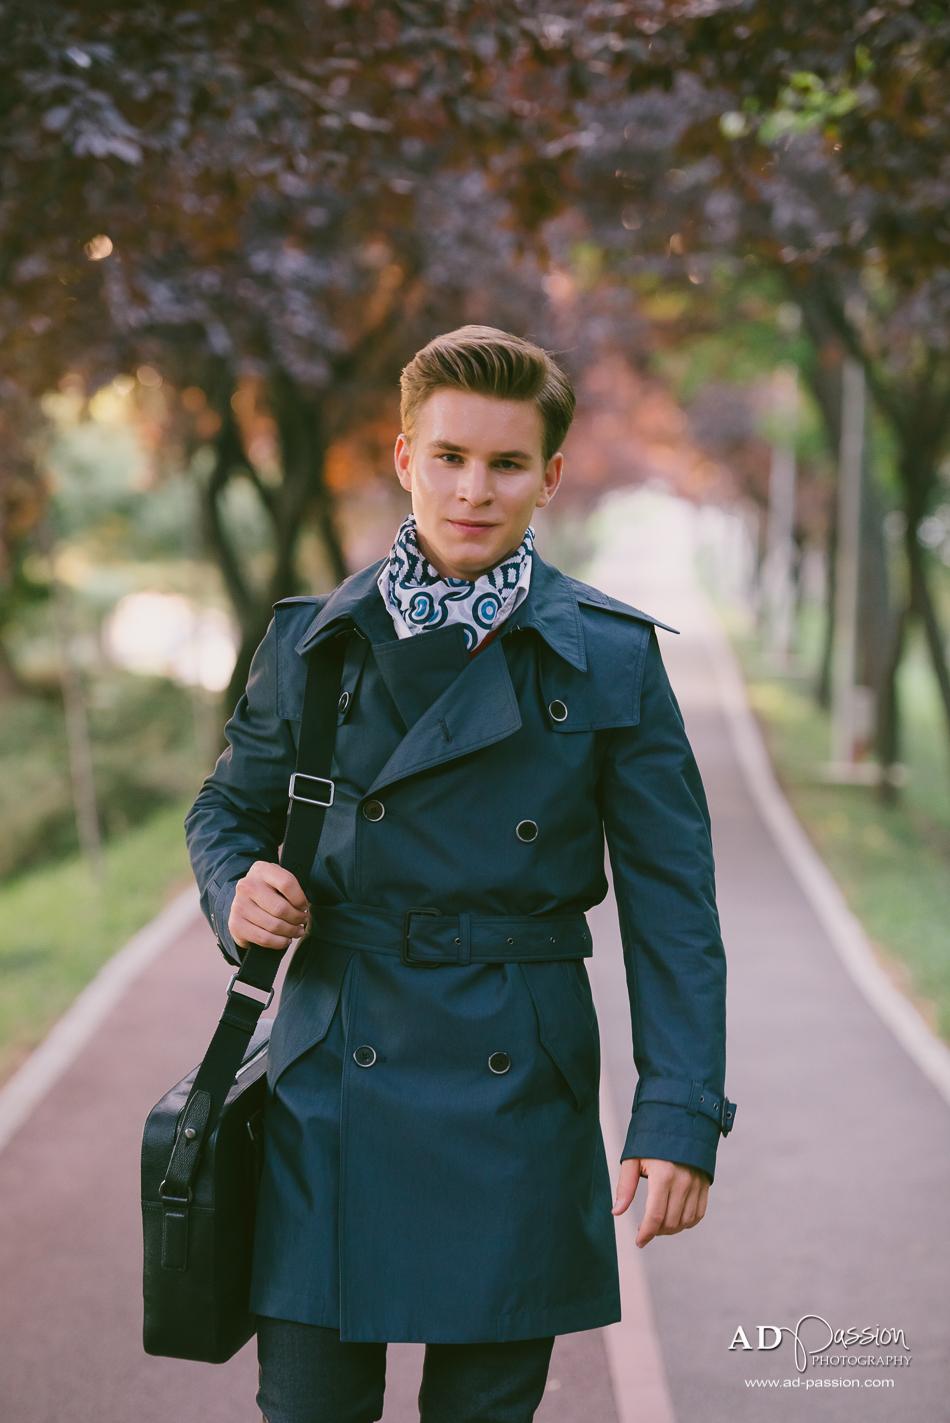 AD Passion Photography | 20150915_andrei_0223 | Adelin, Dida, fotograf profesionist, fotograf de nunta, fotografie de nunta, fotograf Timisoara, fotograf Craiova, fotograf Bucuresti, fotograf Arad, nunta Timisoara, nunta Arad, nunta Bucuresti, nunta Craiova